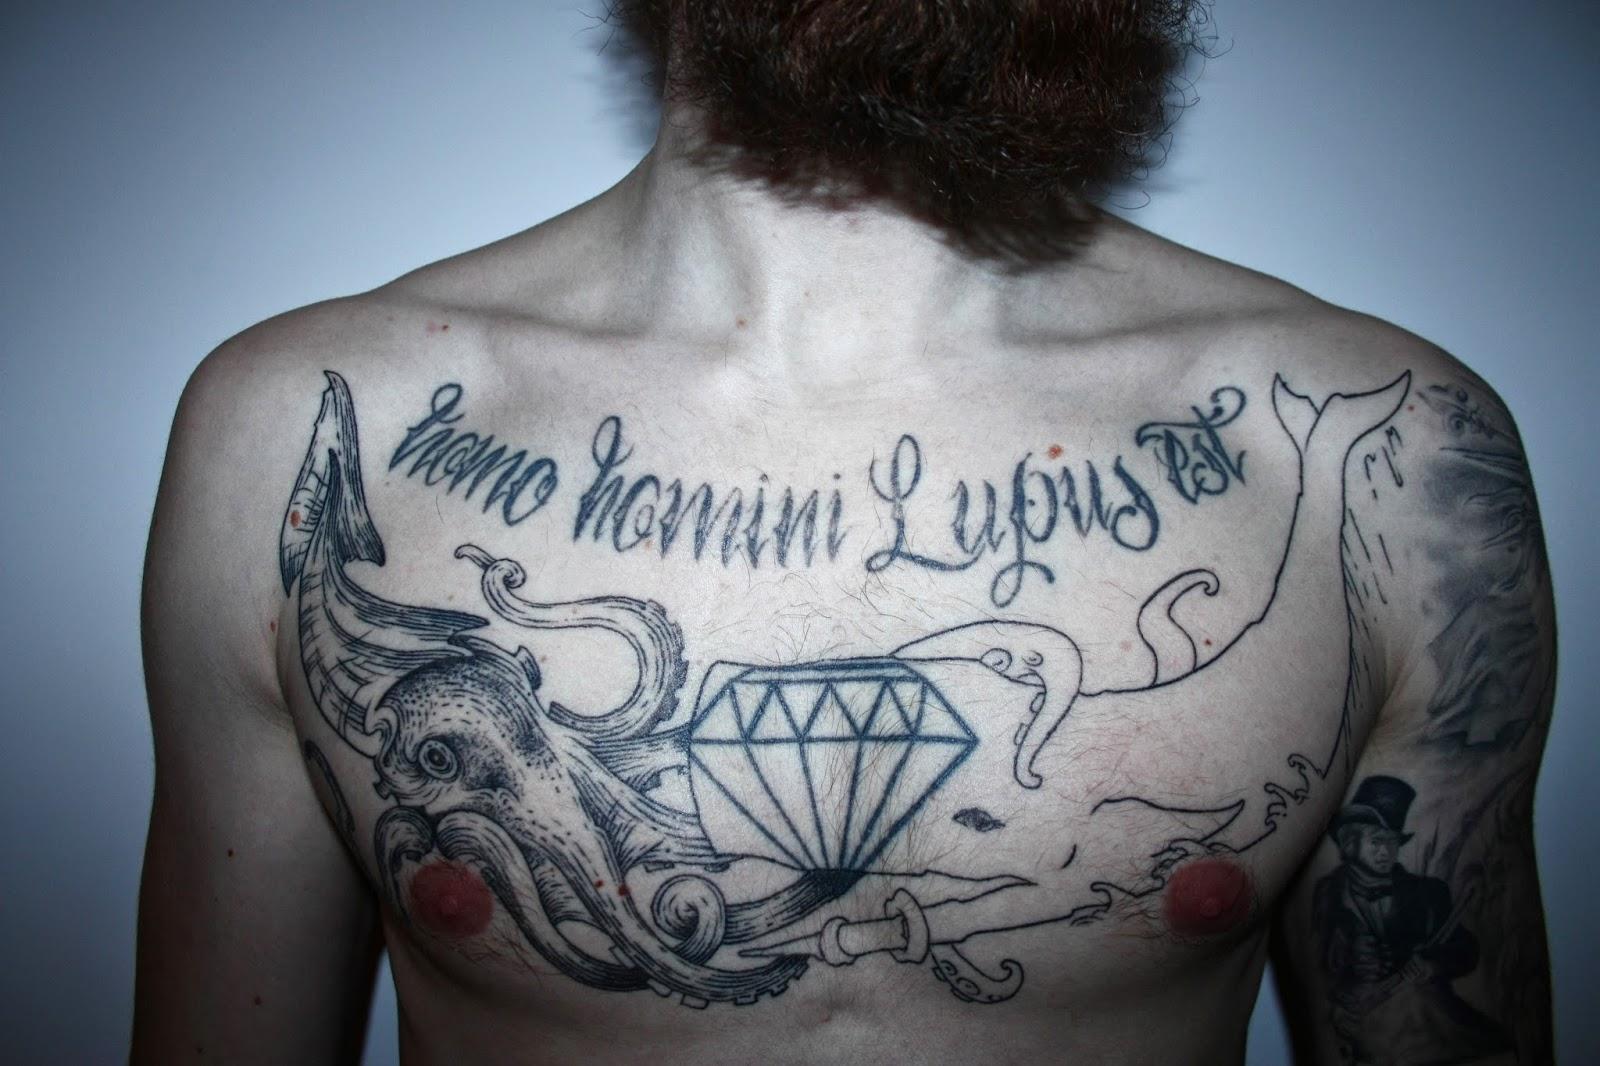 Diamant Tattoo Brust Tattoo Pottwal spermwhale Kraken Octopus tattoo Coverup breast